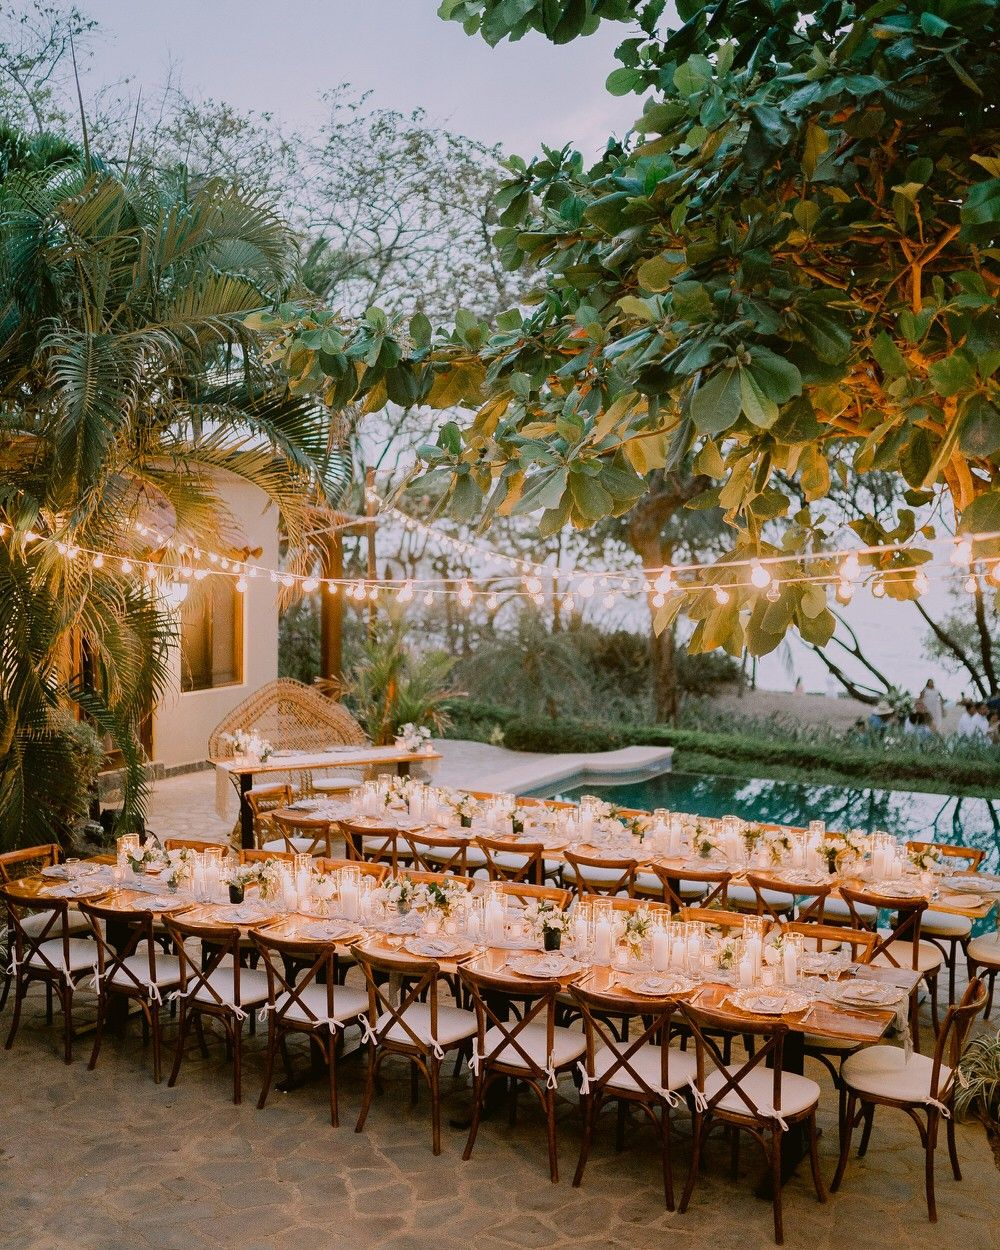 Tropical Boho Destination Wedding in Costa Rica with Blue Hues